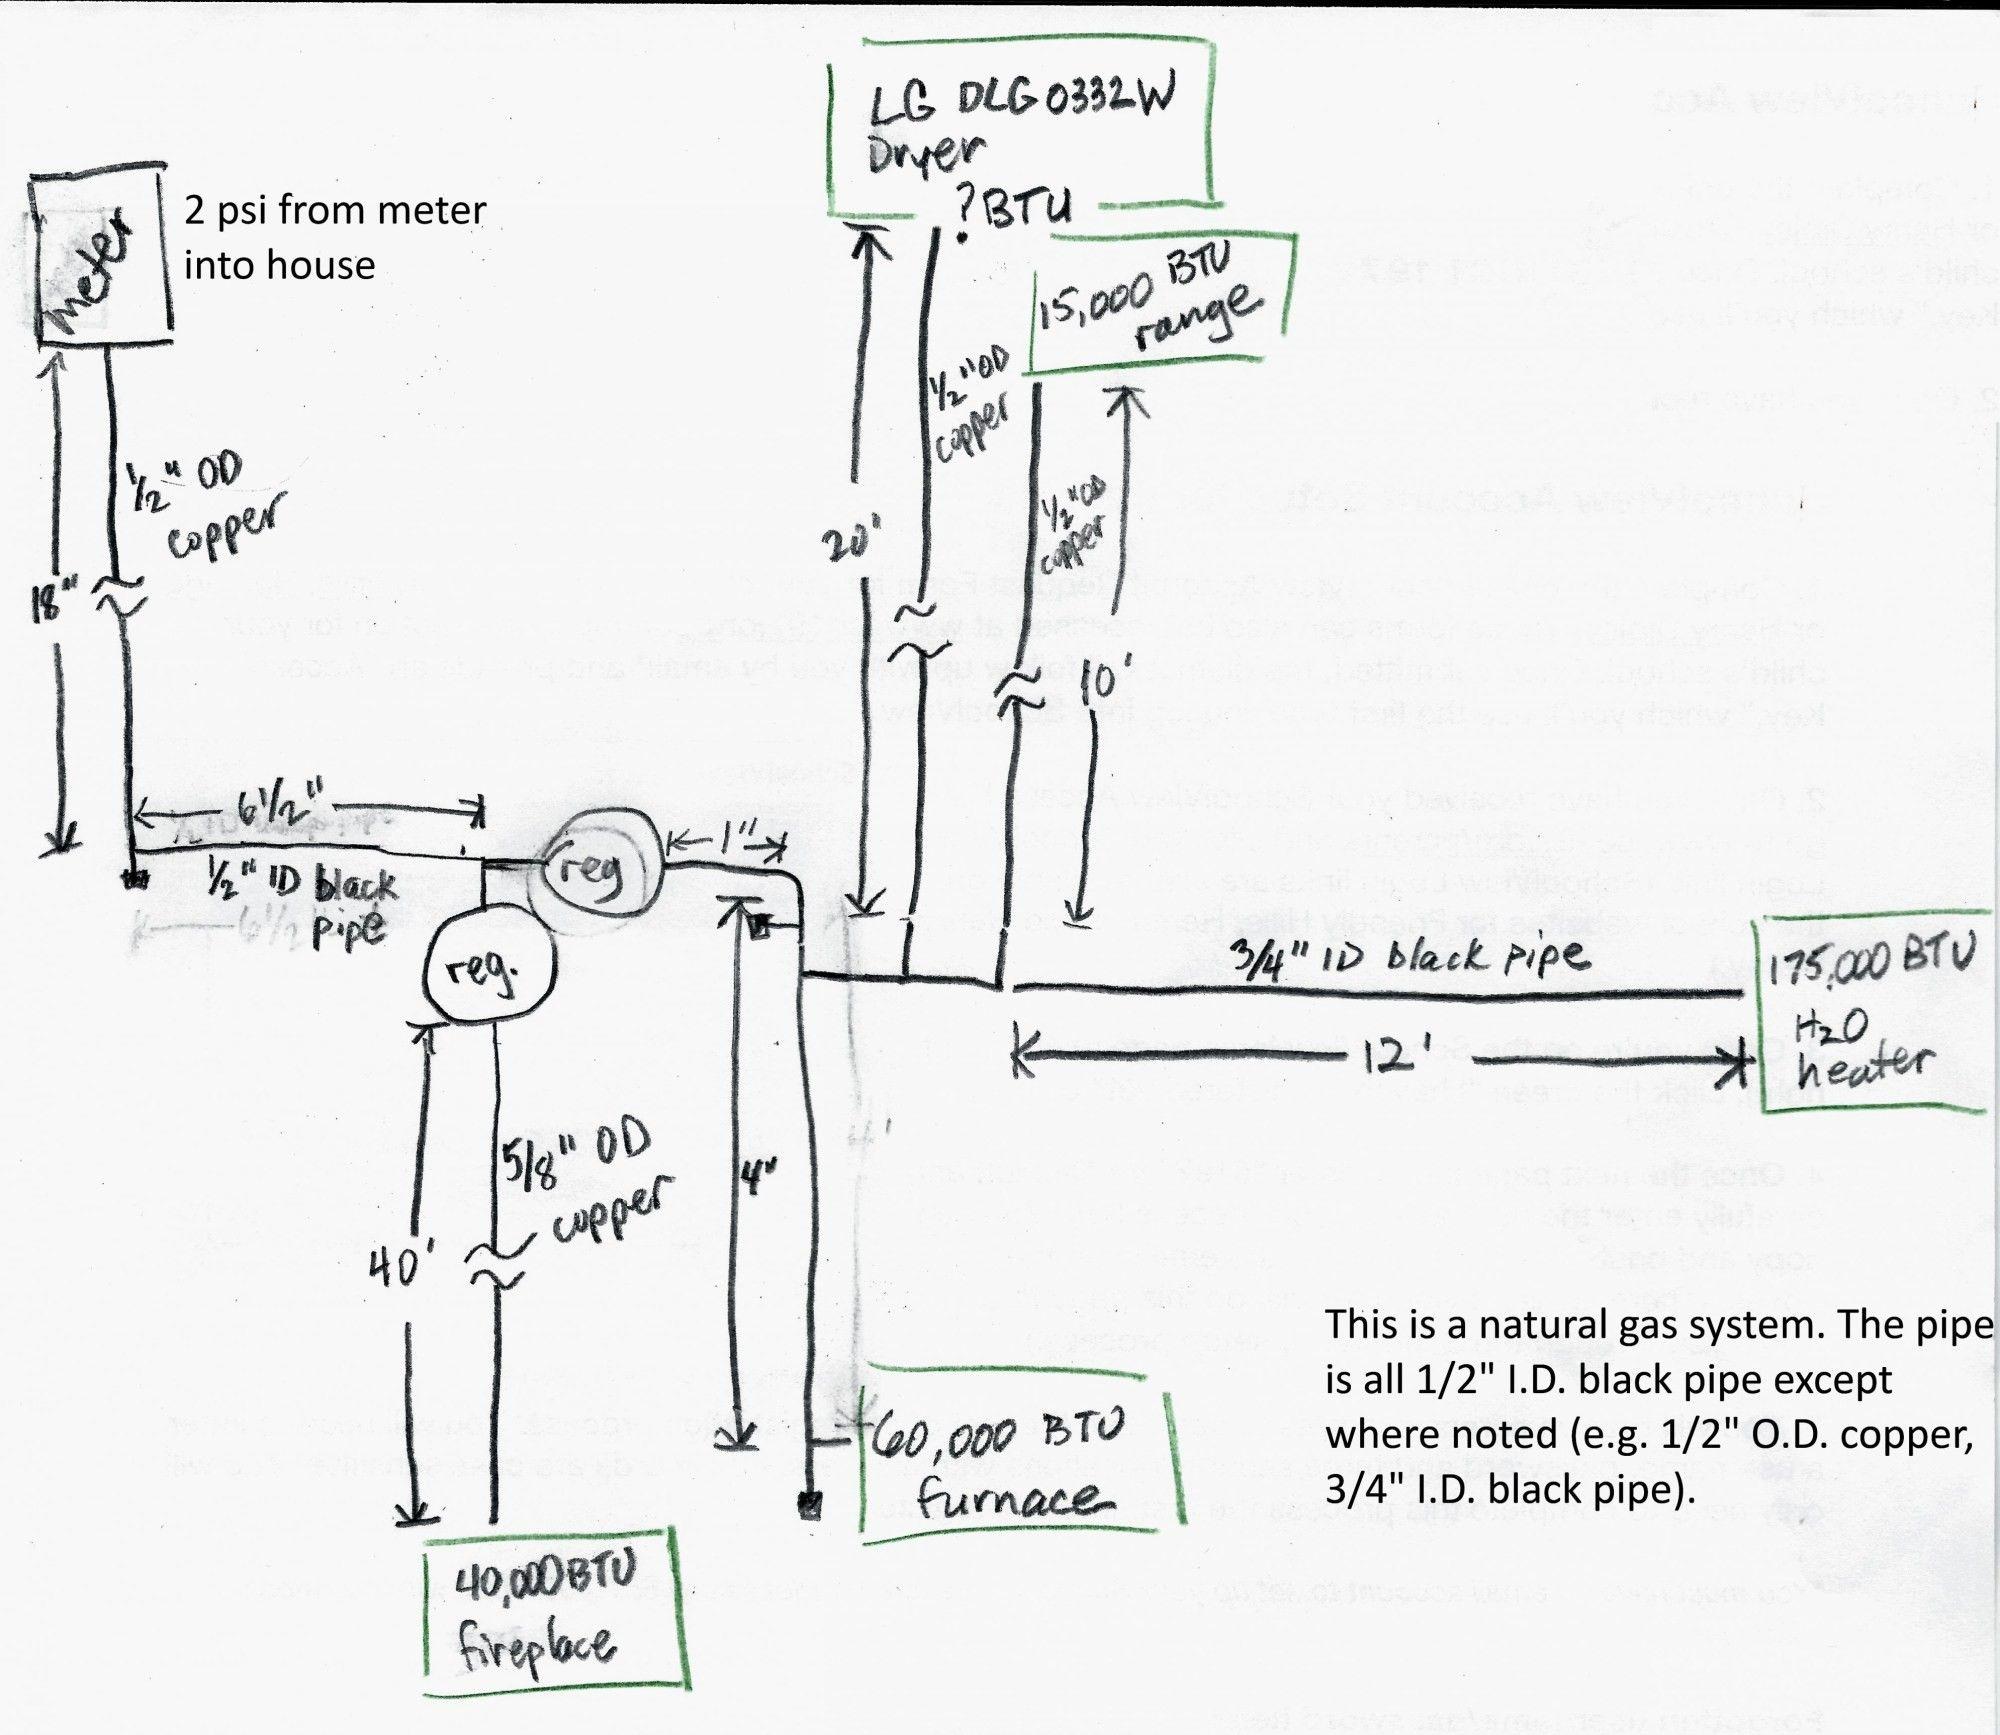 New 2002 Dodge Ram 1500 Alarm Wiring Diagram Electrical Circuit Diagram Electrical Wiring Diagram Trailer Wiring Diagram